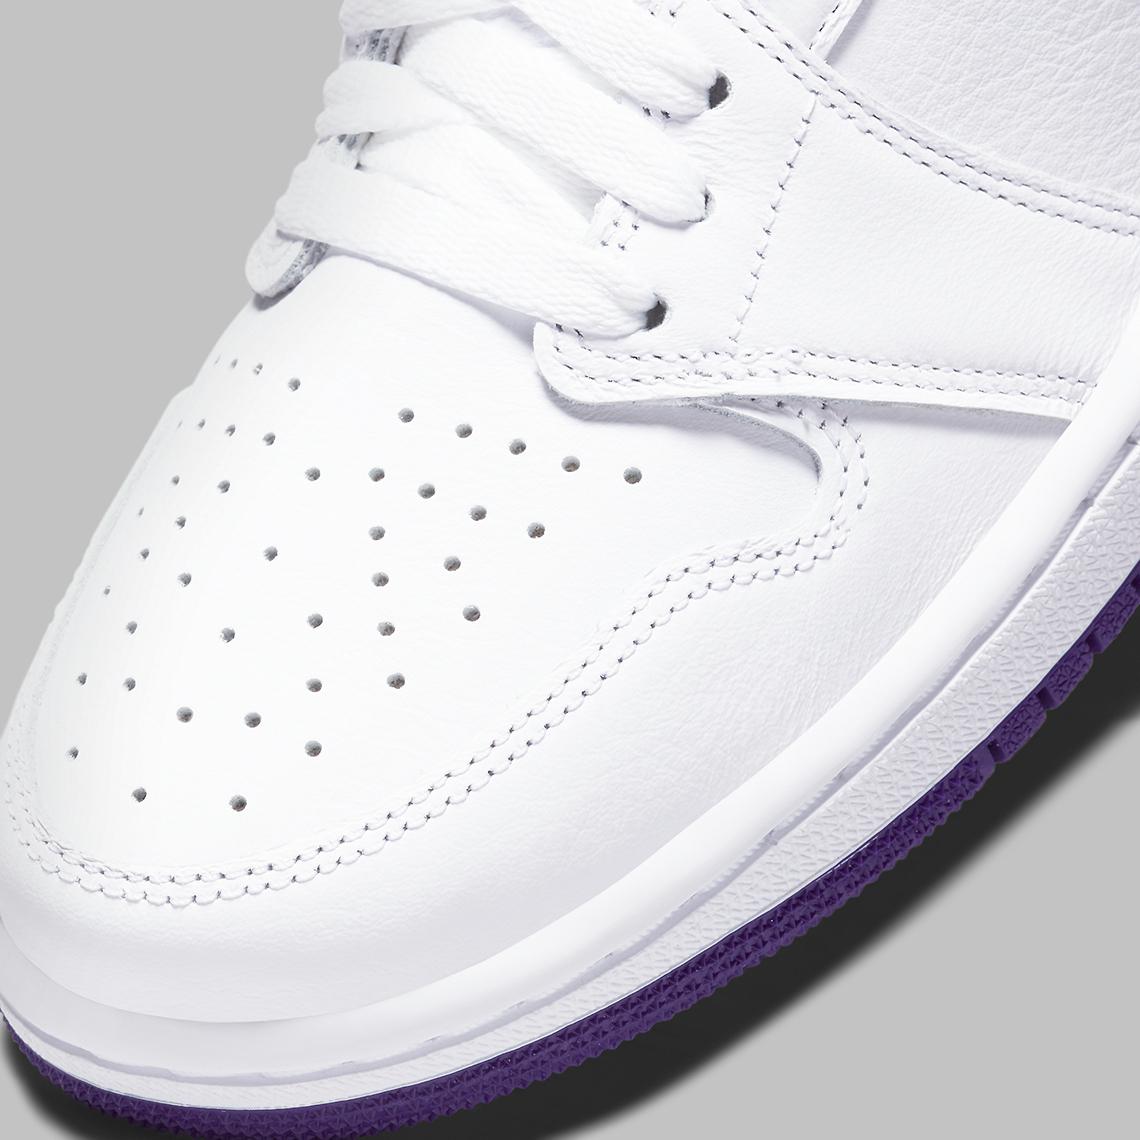 Air Jordan 1 Retro High OG WMNS ''Court Purple'' - CD0461-151